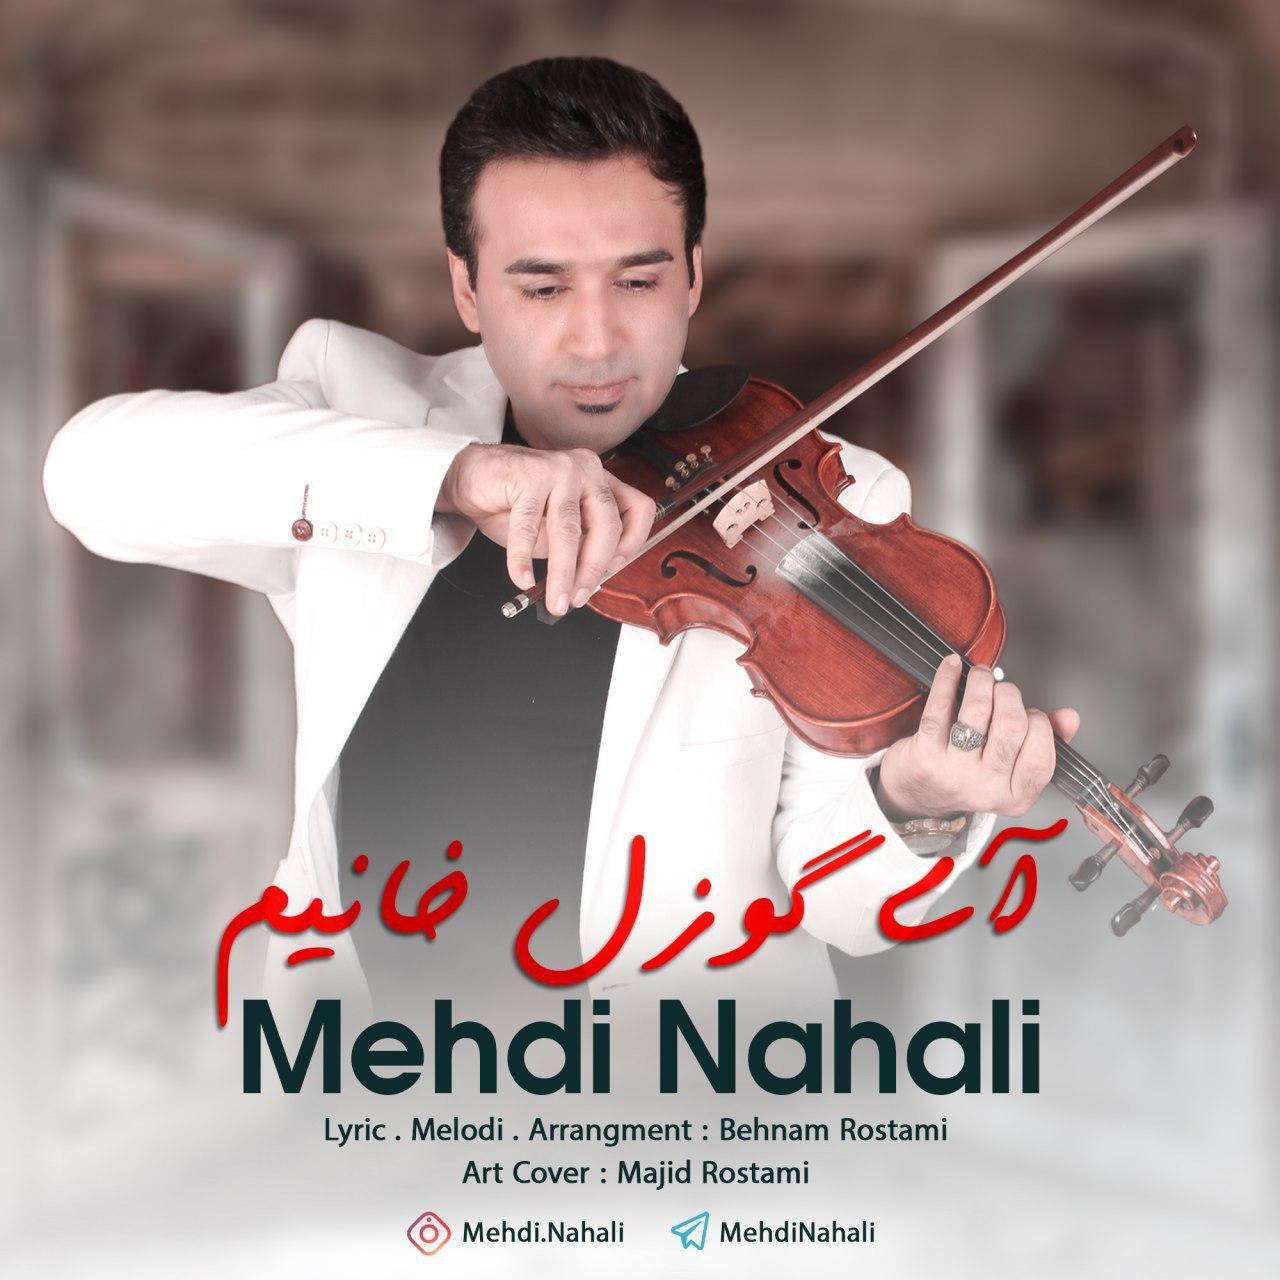 http://s7.picofile.com/file/8392346368/17Mehdi_Nahali_Ay_Quzal_Xanim.jpg